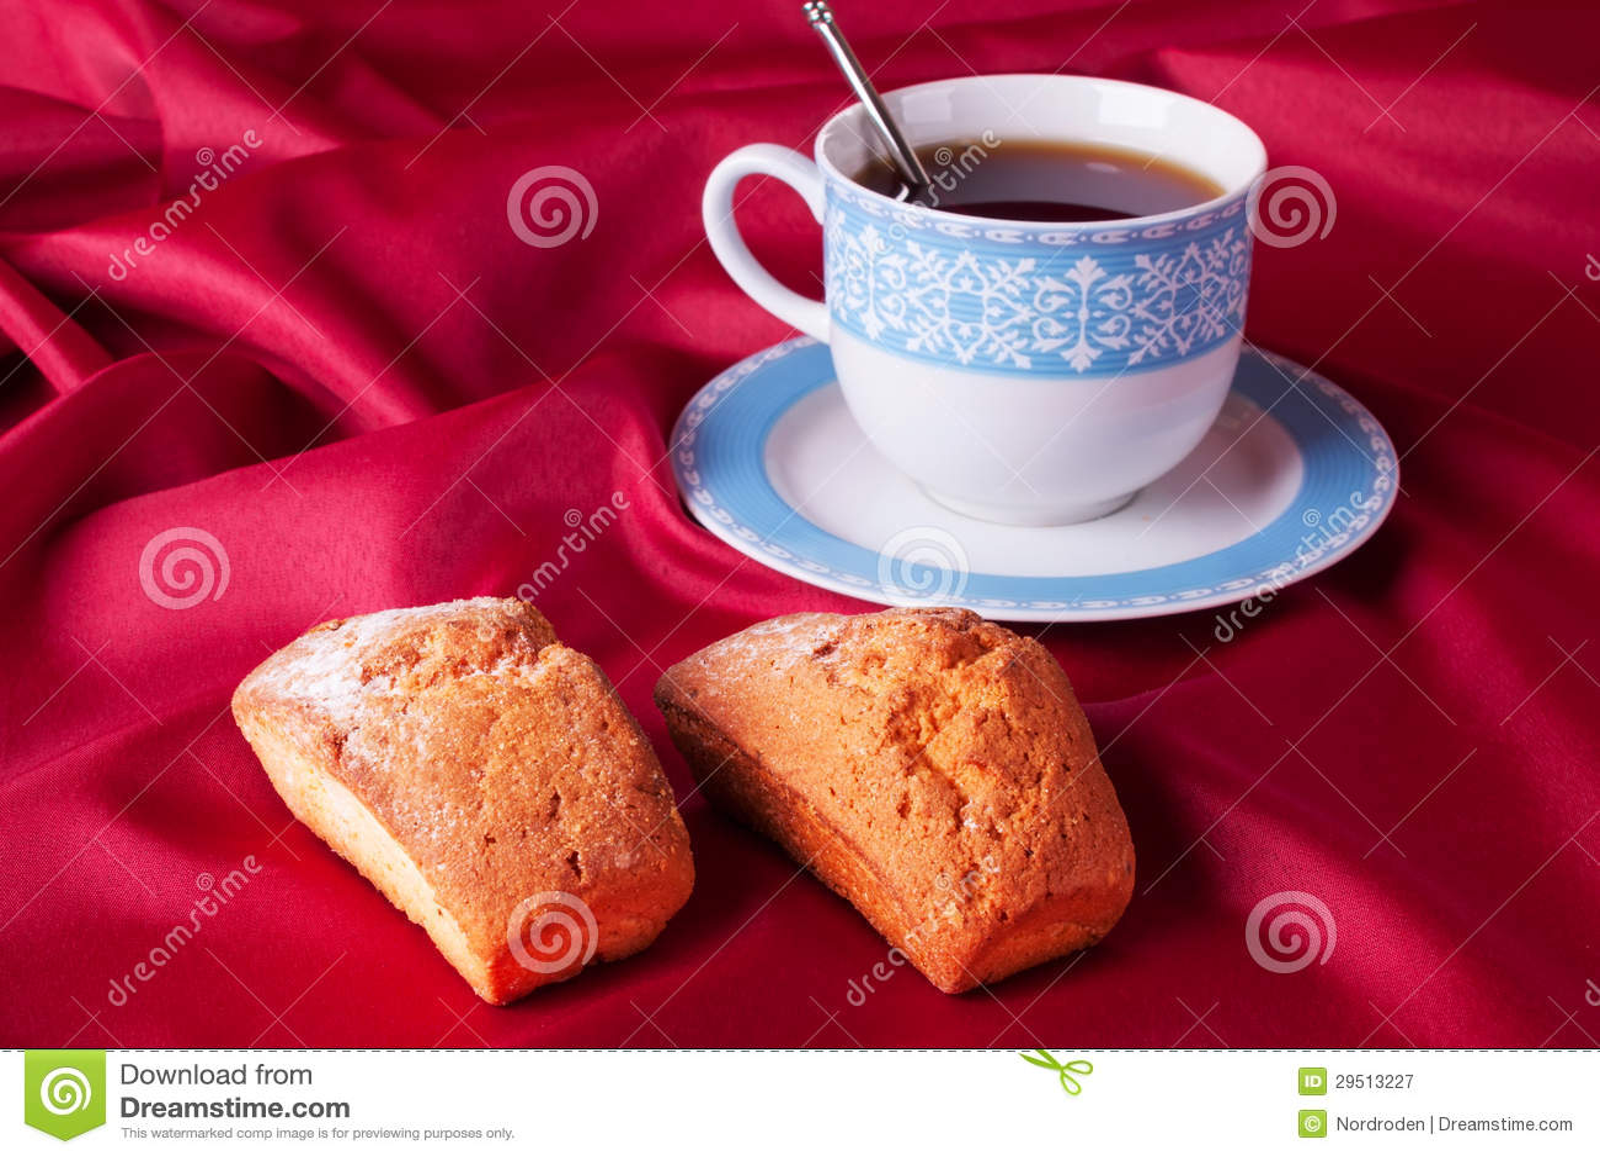 Cake en blauwe theekop